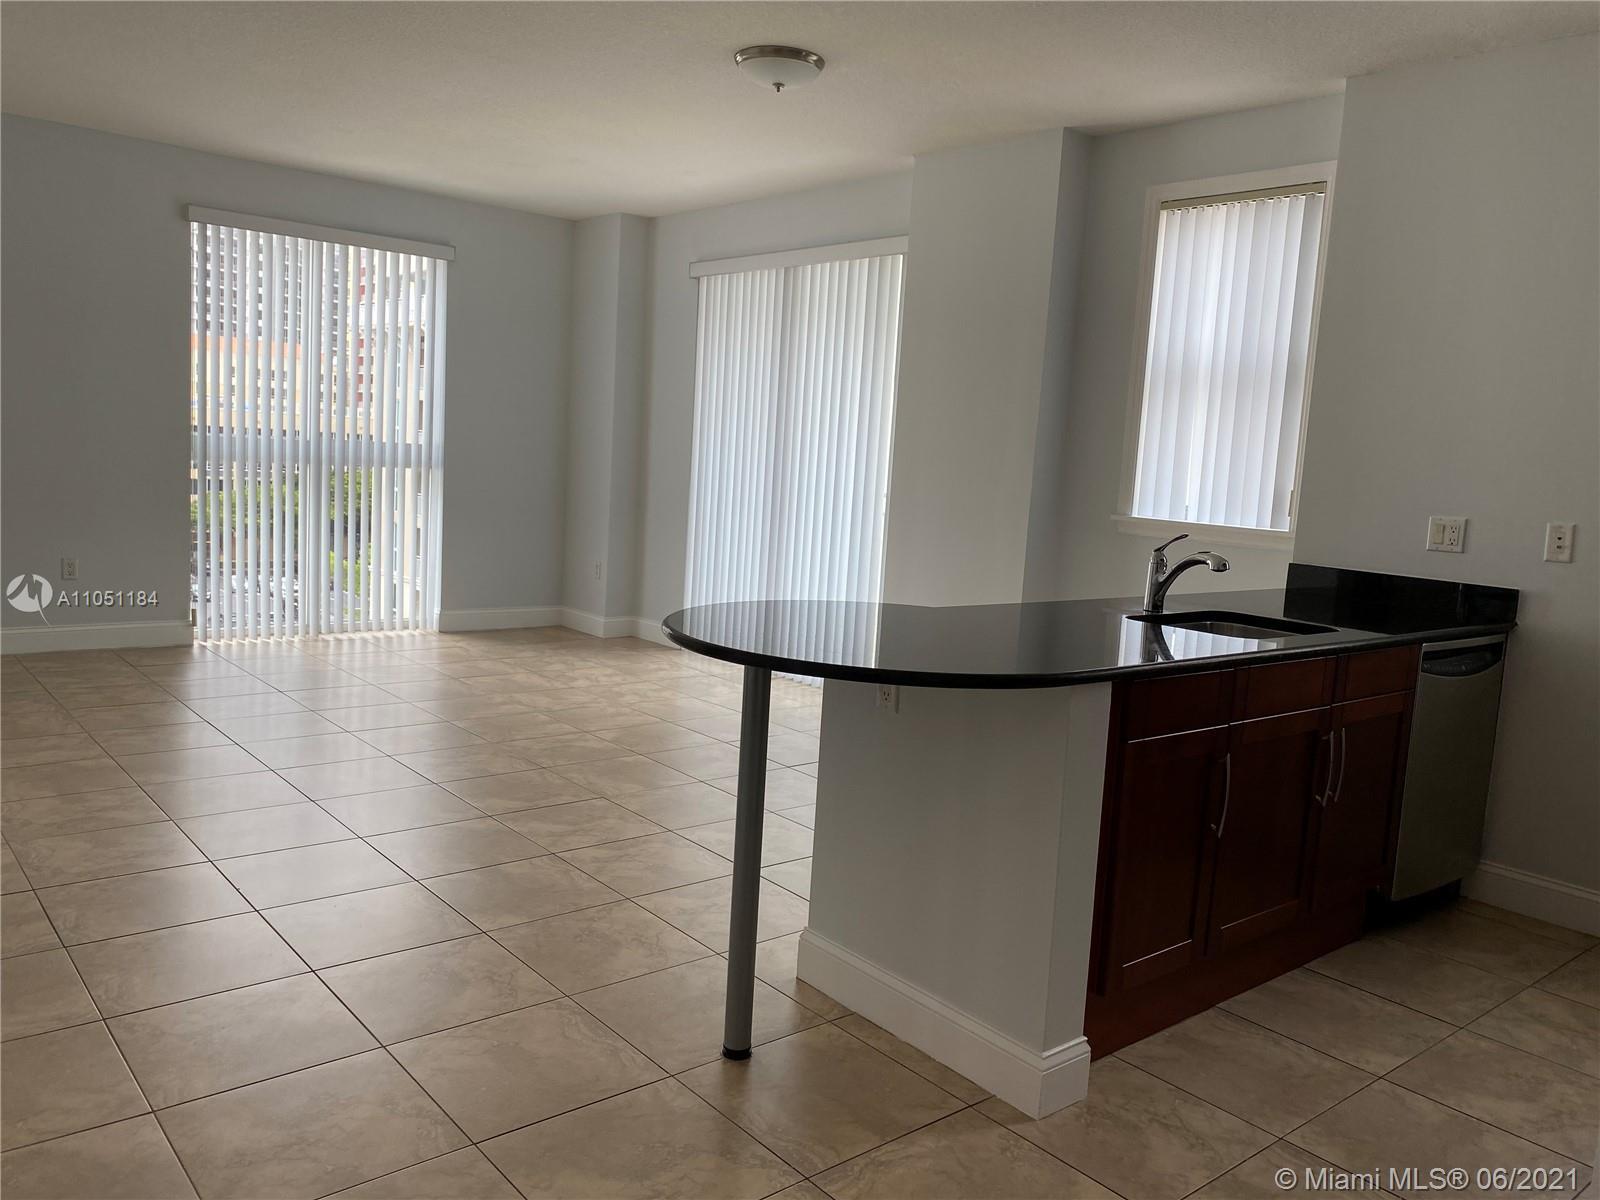 Downtown Dadeland Building E #501 - 7280 SW 90th St #501, Miami, FL 33156